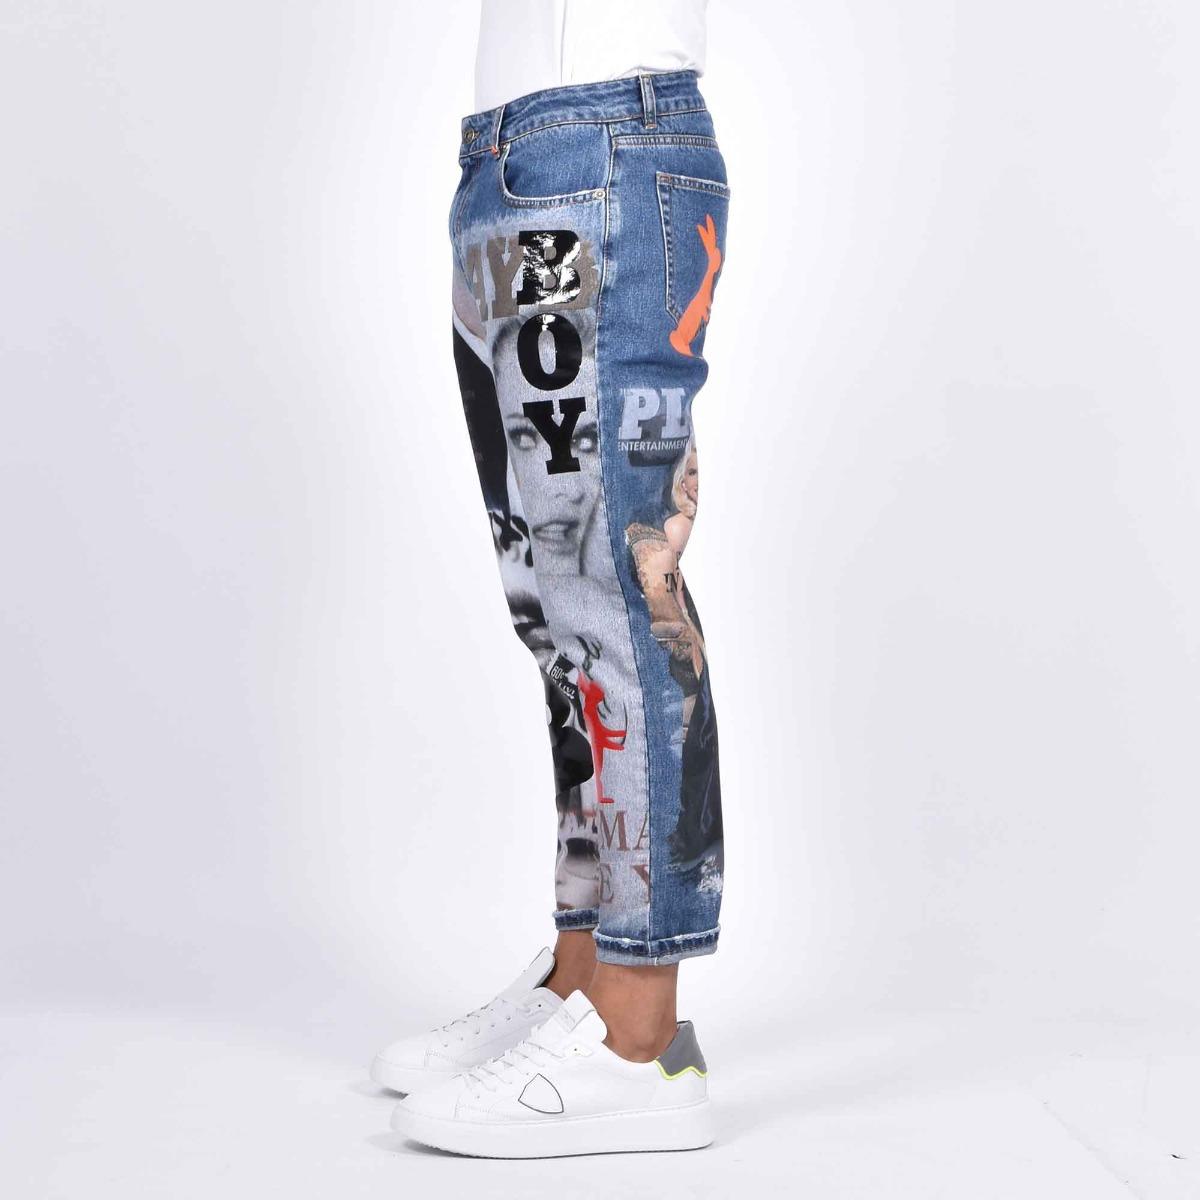 Jeans stampa playboy - Denim